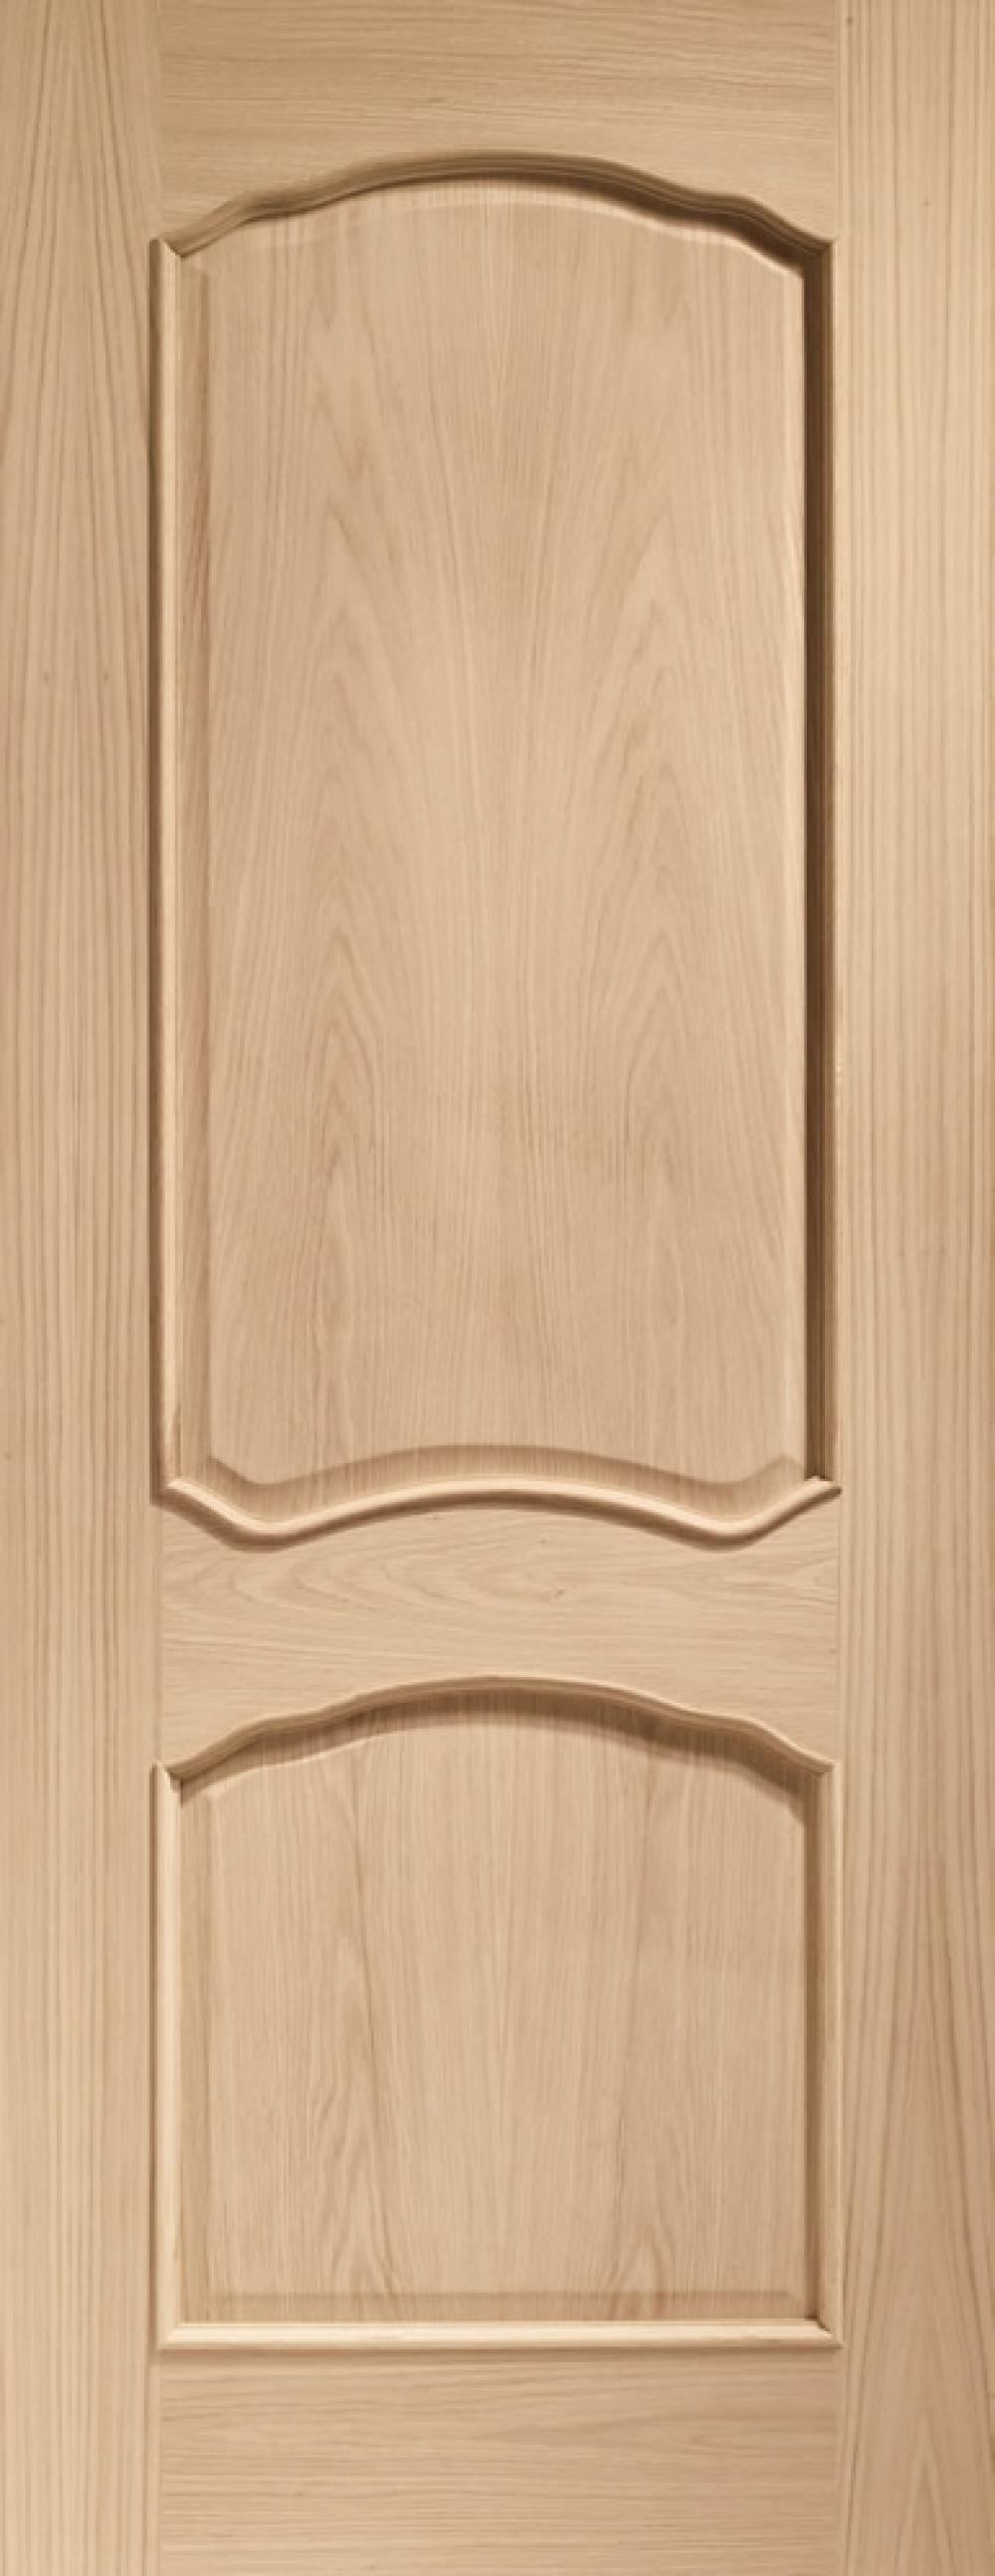 Xl Louis Oak Prefinished - Raised Mouldings Image